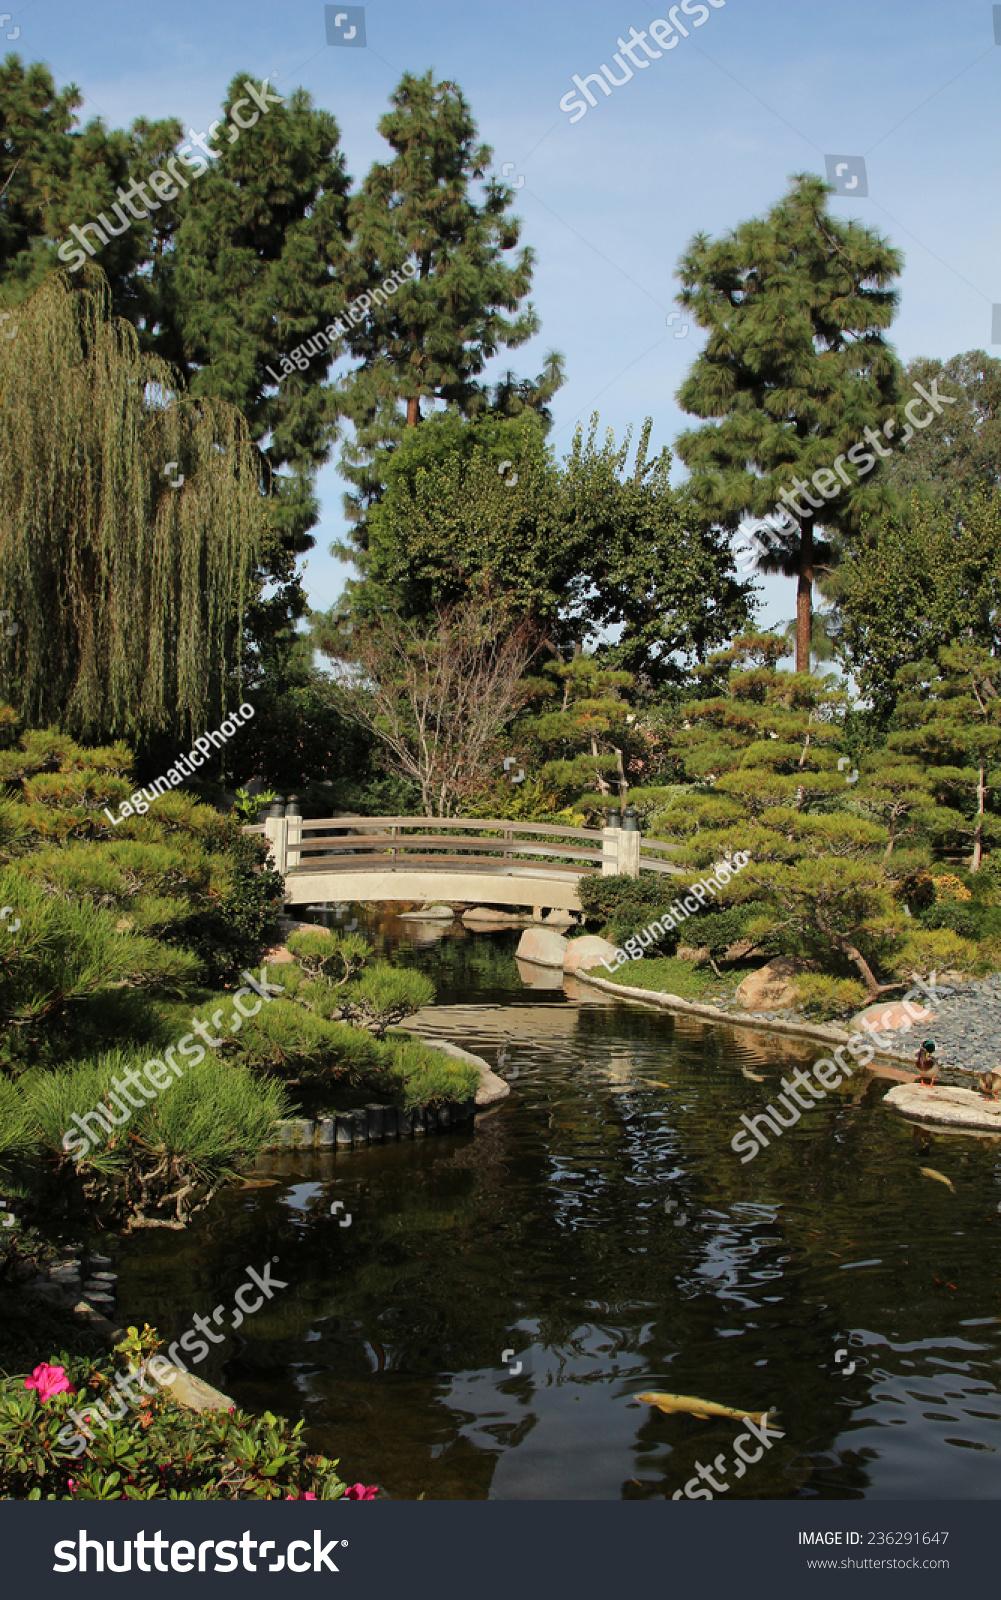 Koi Pond Earl Burns Miller Japanese Stock Photo (Royalty Free ...